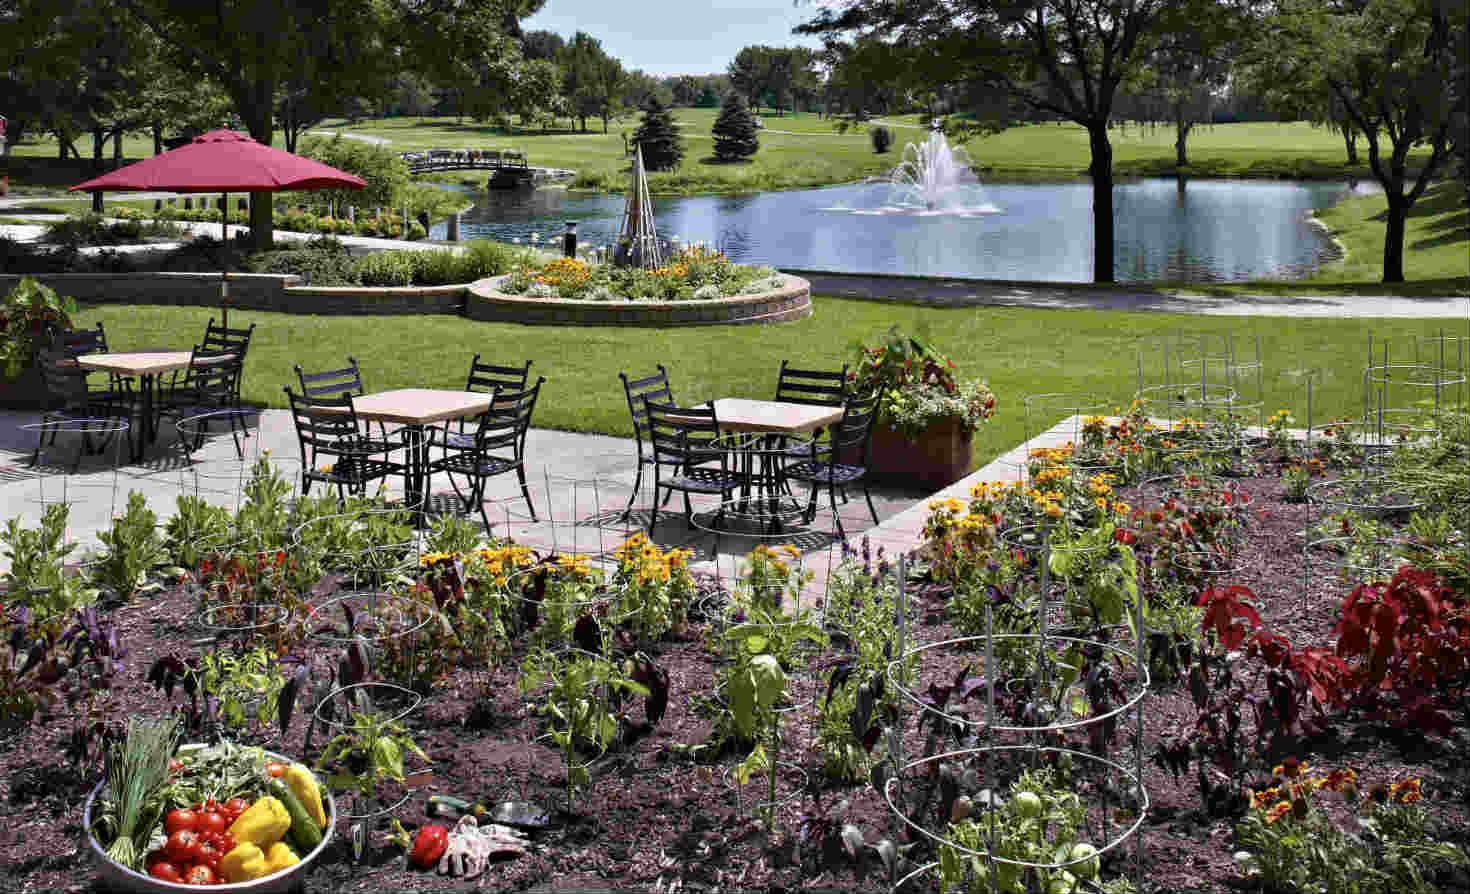 Chef's garden at Hilton Chicago/Oak Brook Hills Resort & Conference Center